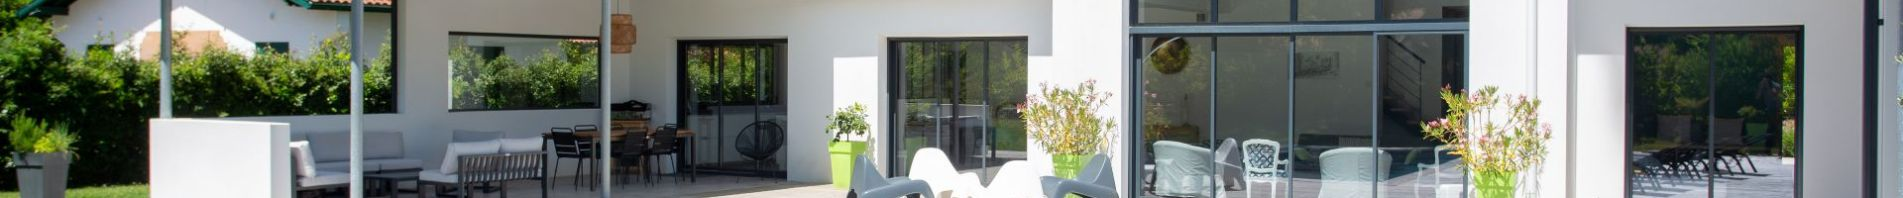 maison-design-avec-terrasse-en-bois